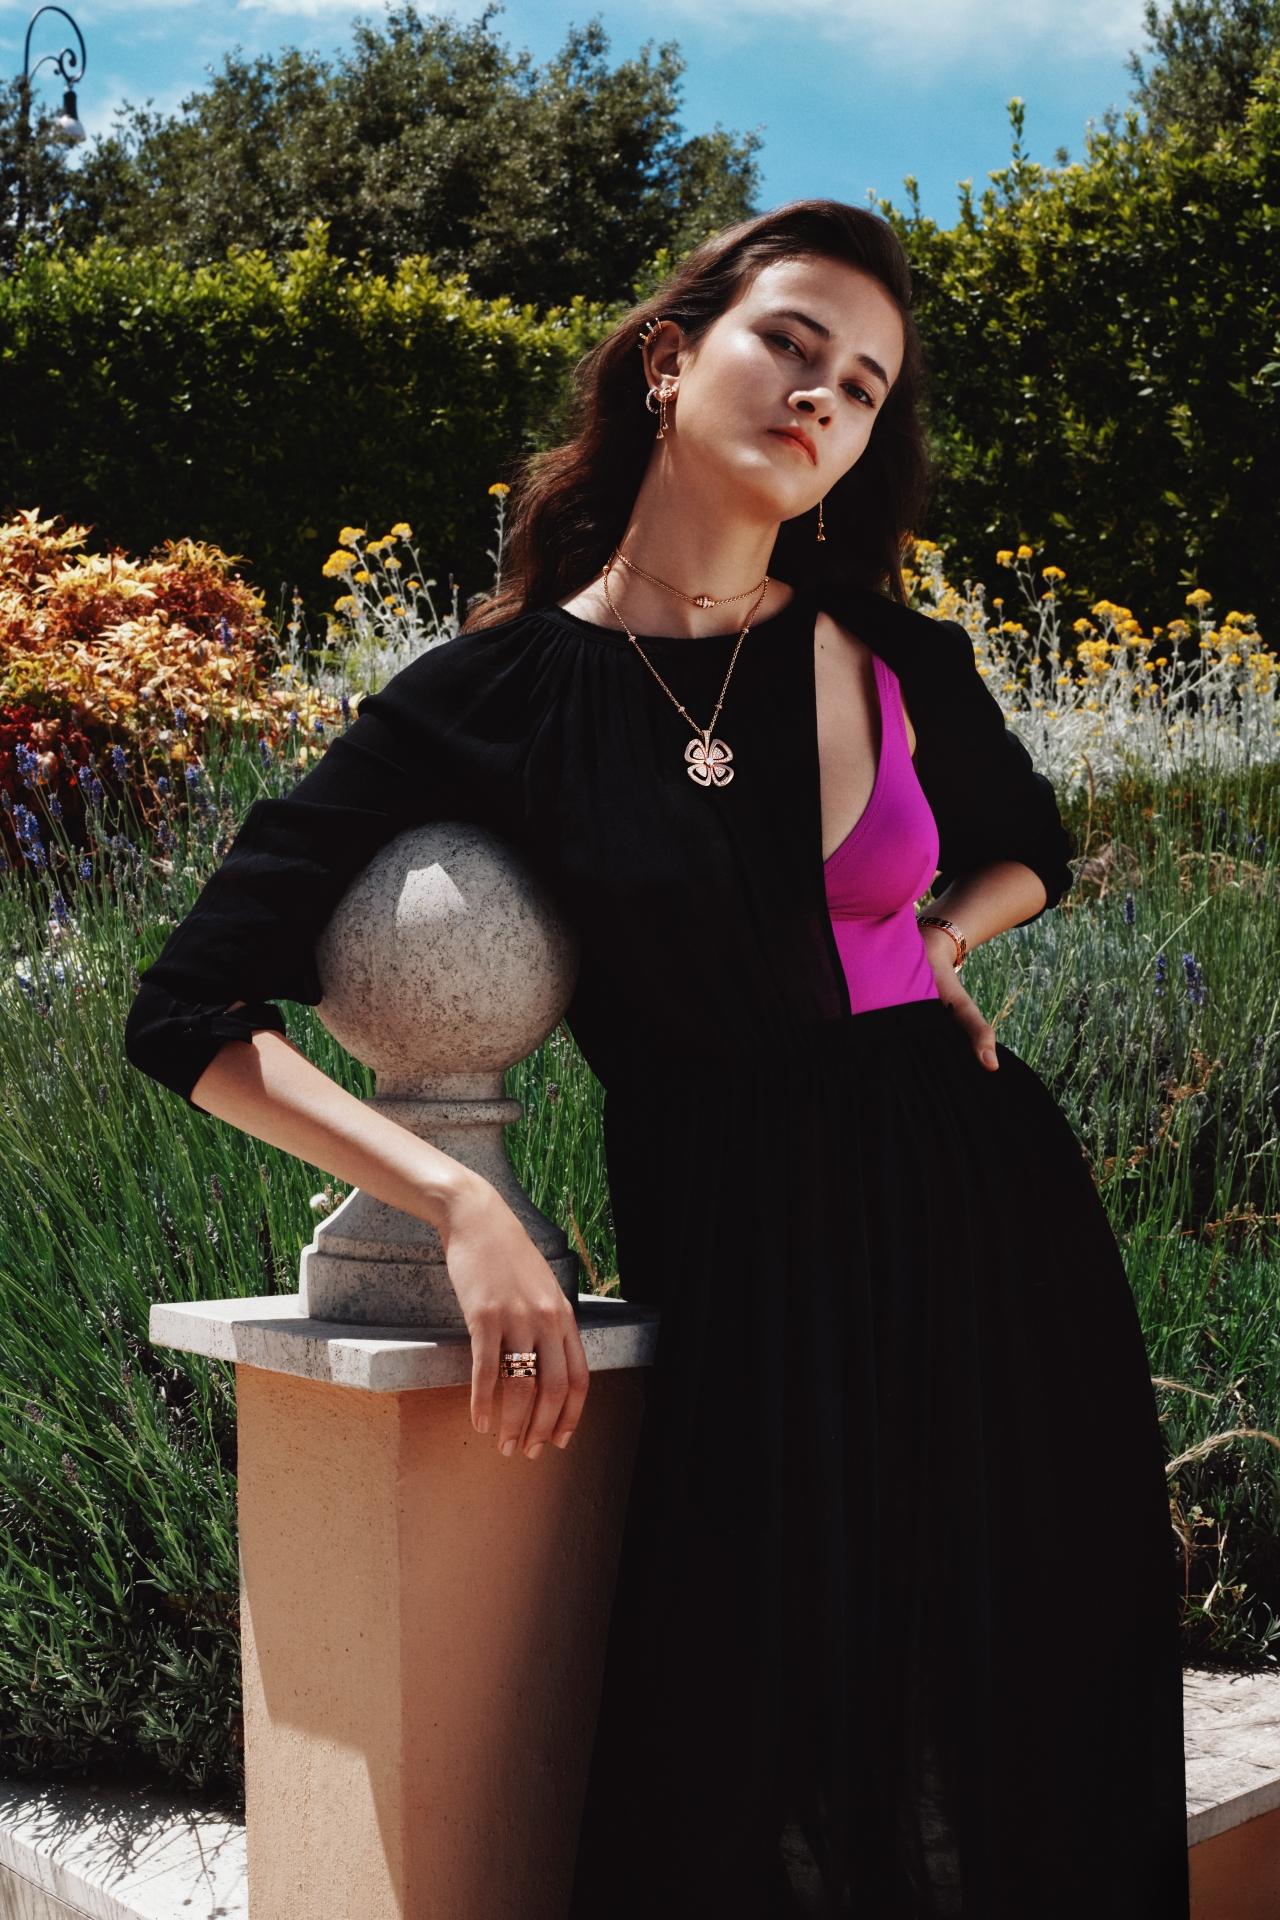 WE GLITTER|女性的夏日守則,義式風情才能閃耀動人